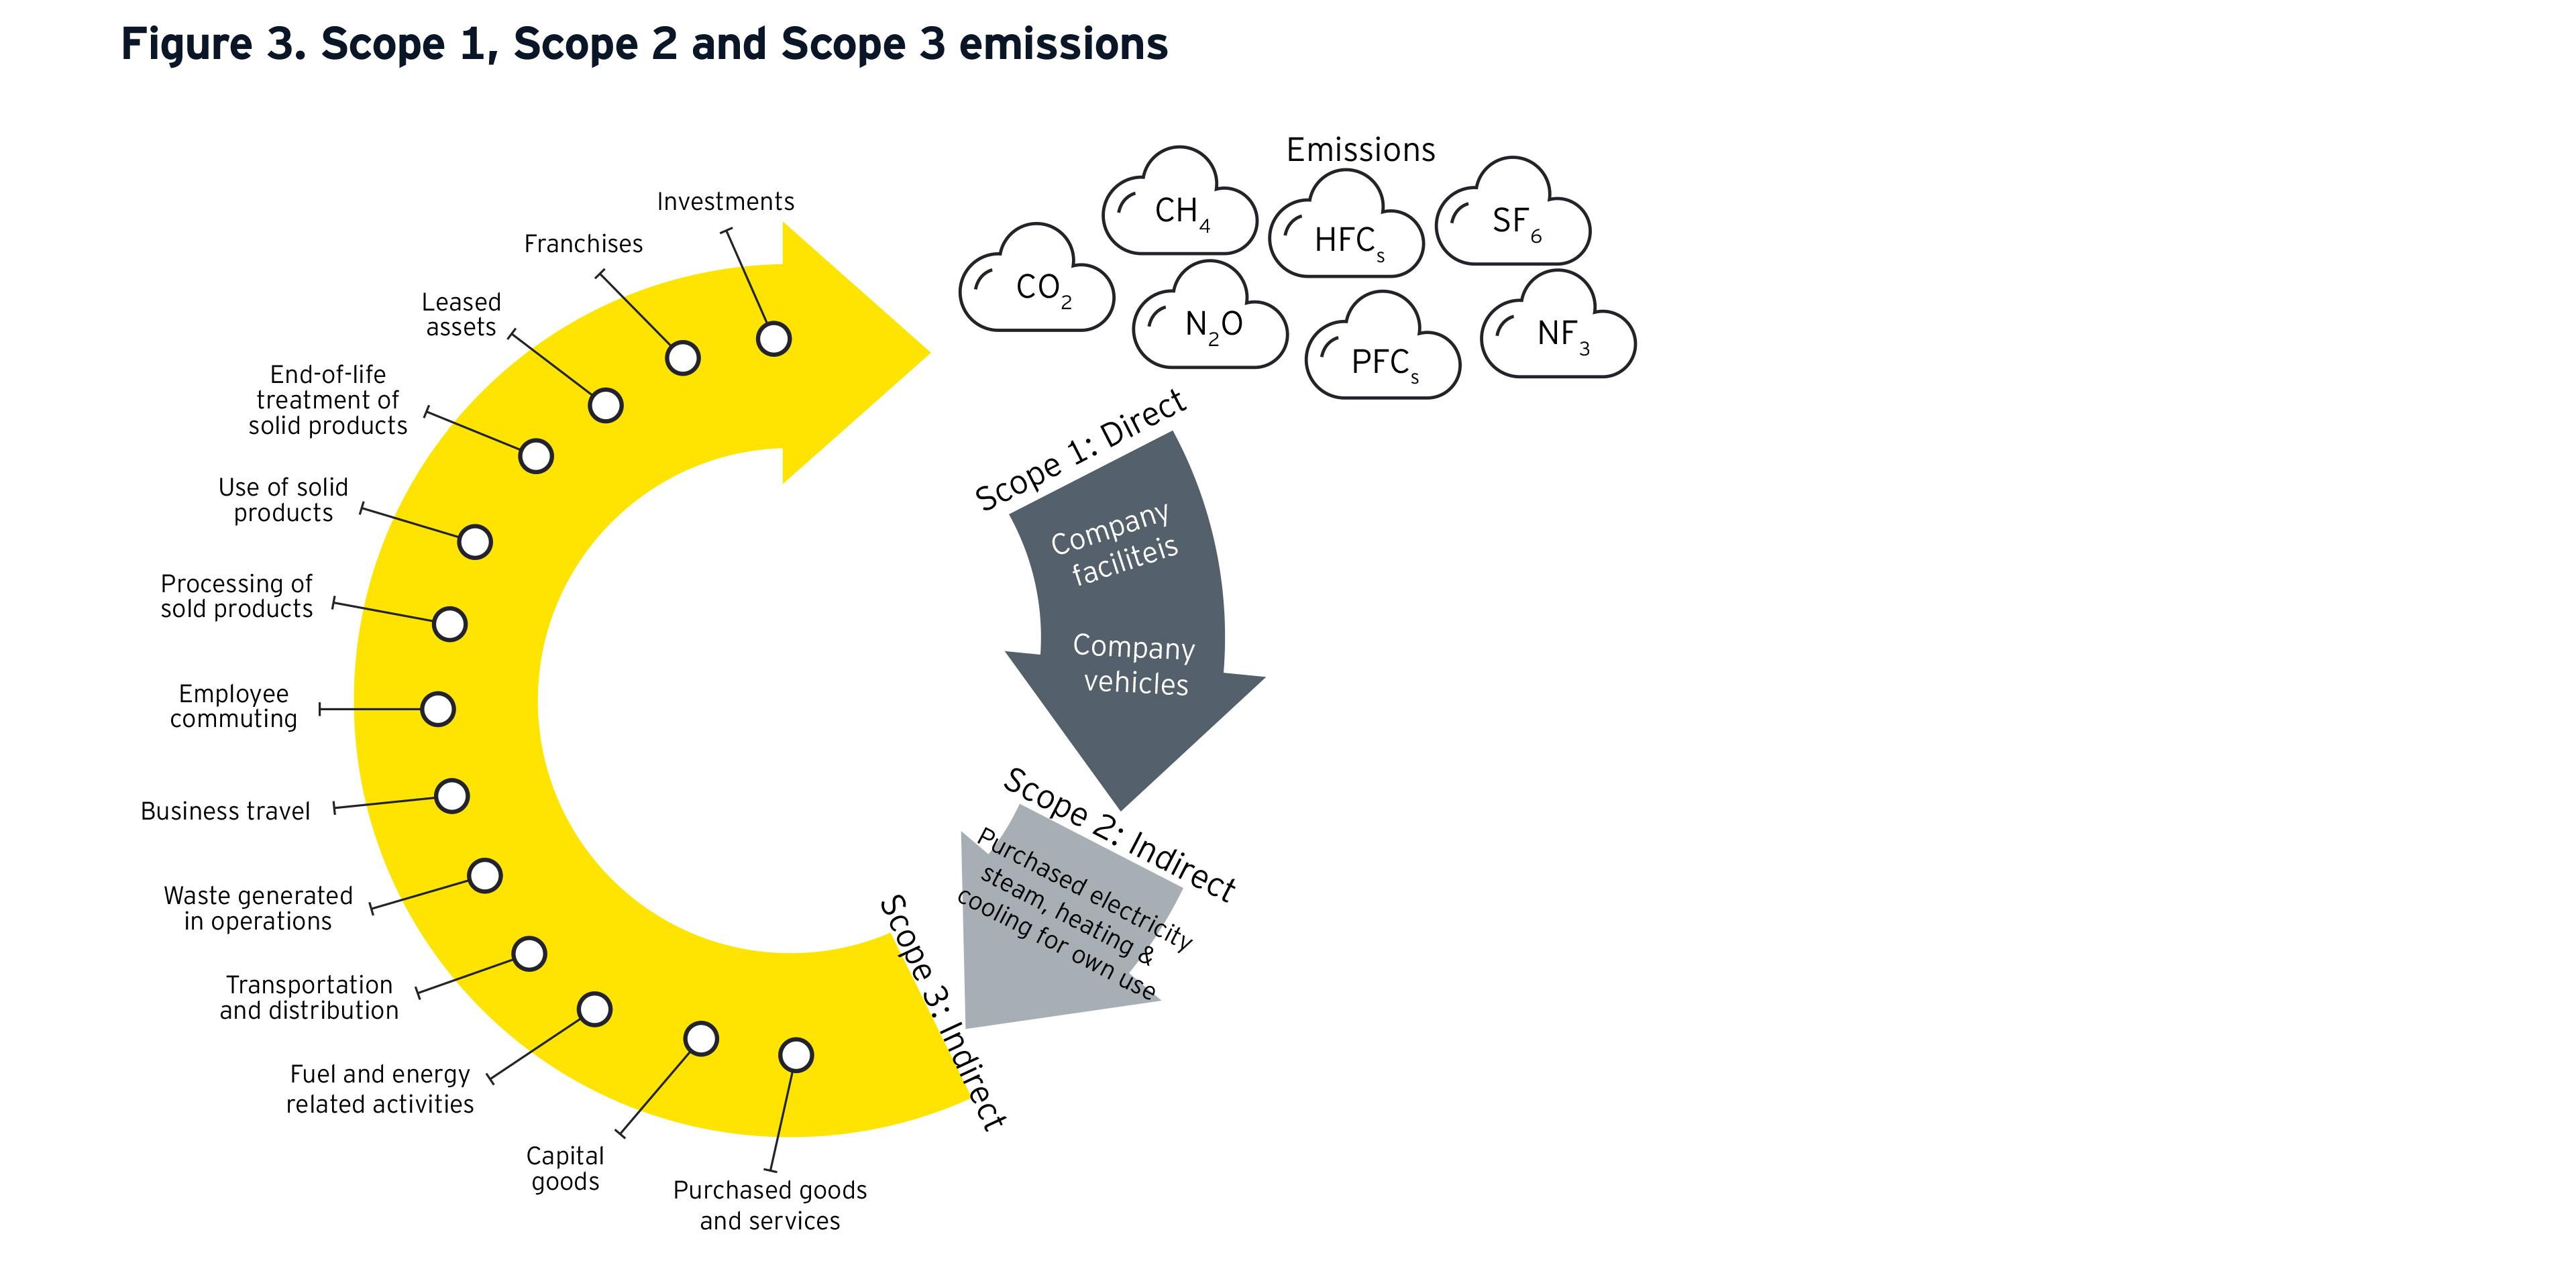 ey-scope1-2-3-emissions